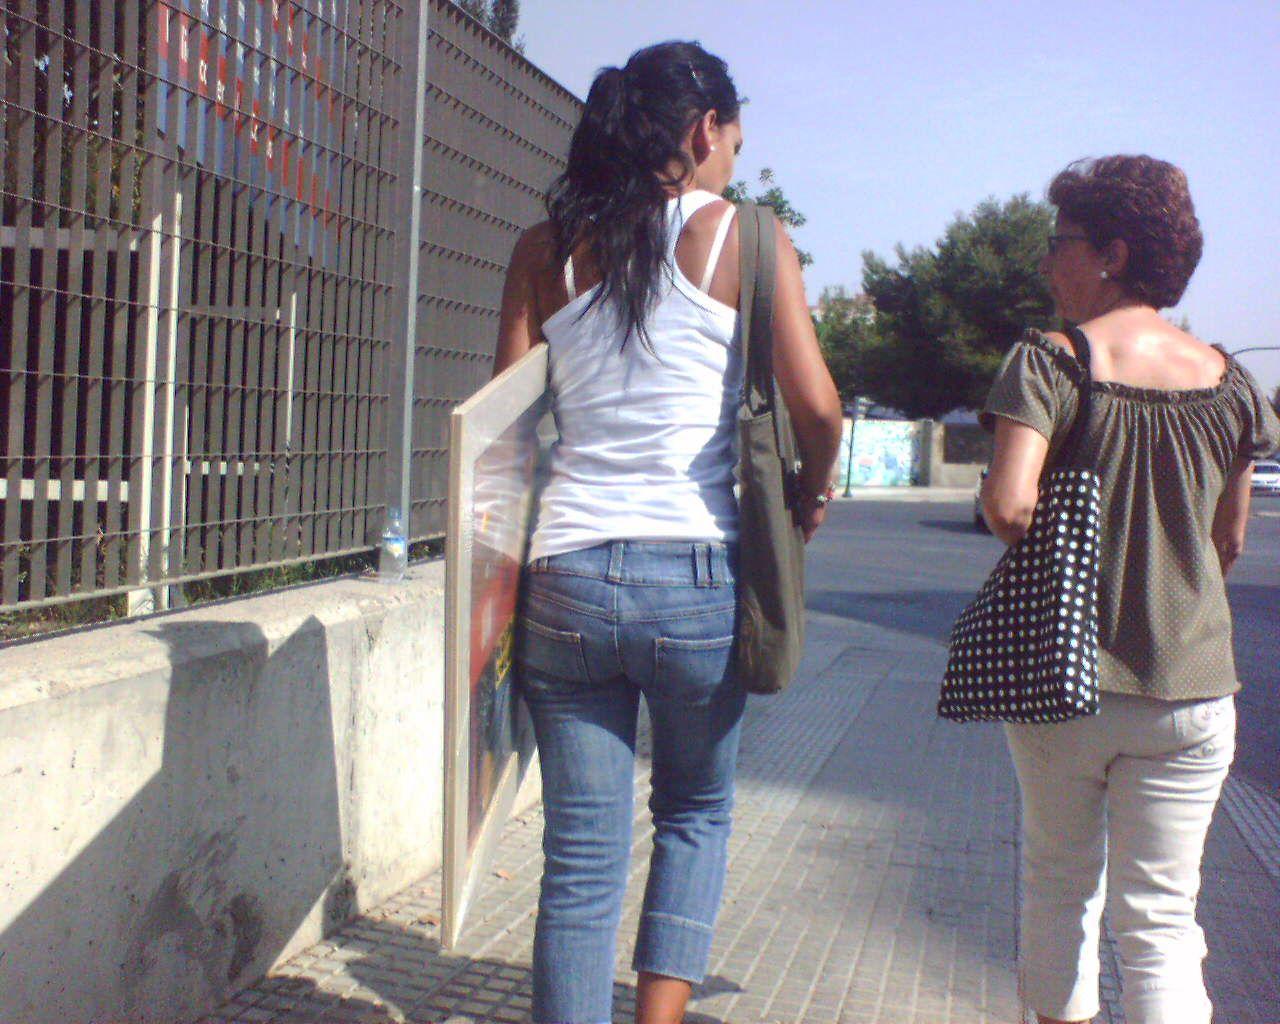 street voyeur pics